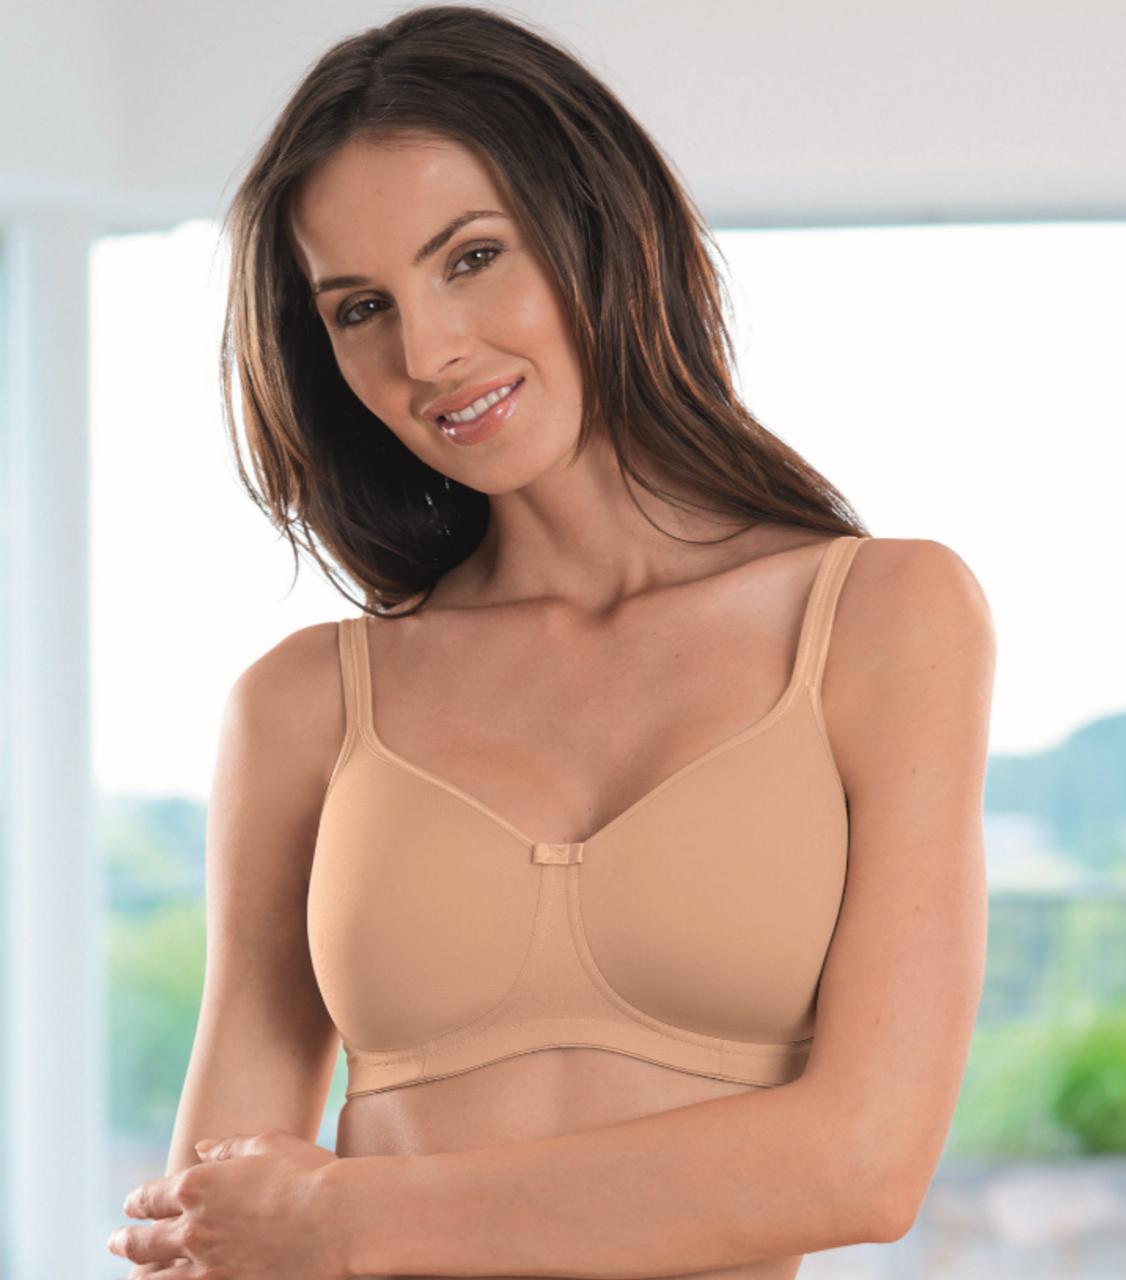 ae50cd6deb Anita Mastectomy Bra- Tonya Padded Tee Shirt Mastectomy Bra Seamless  Prosthesis Bra ...